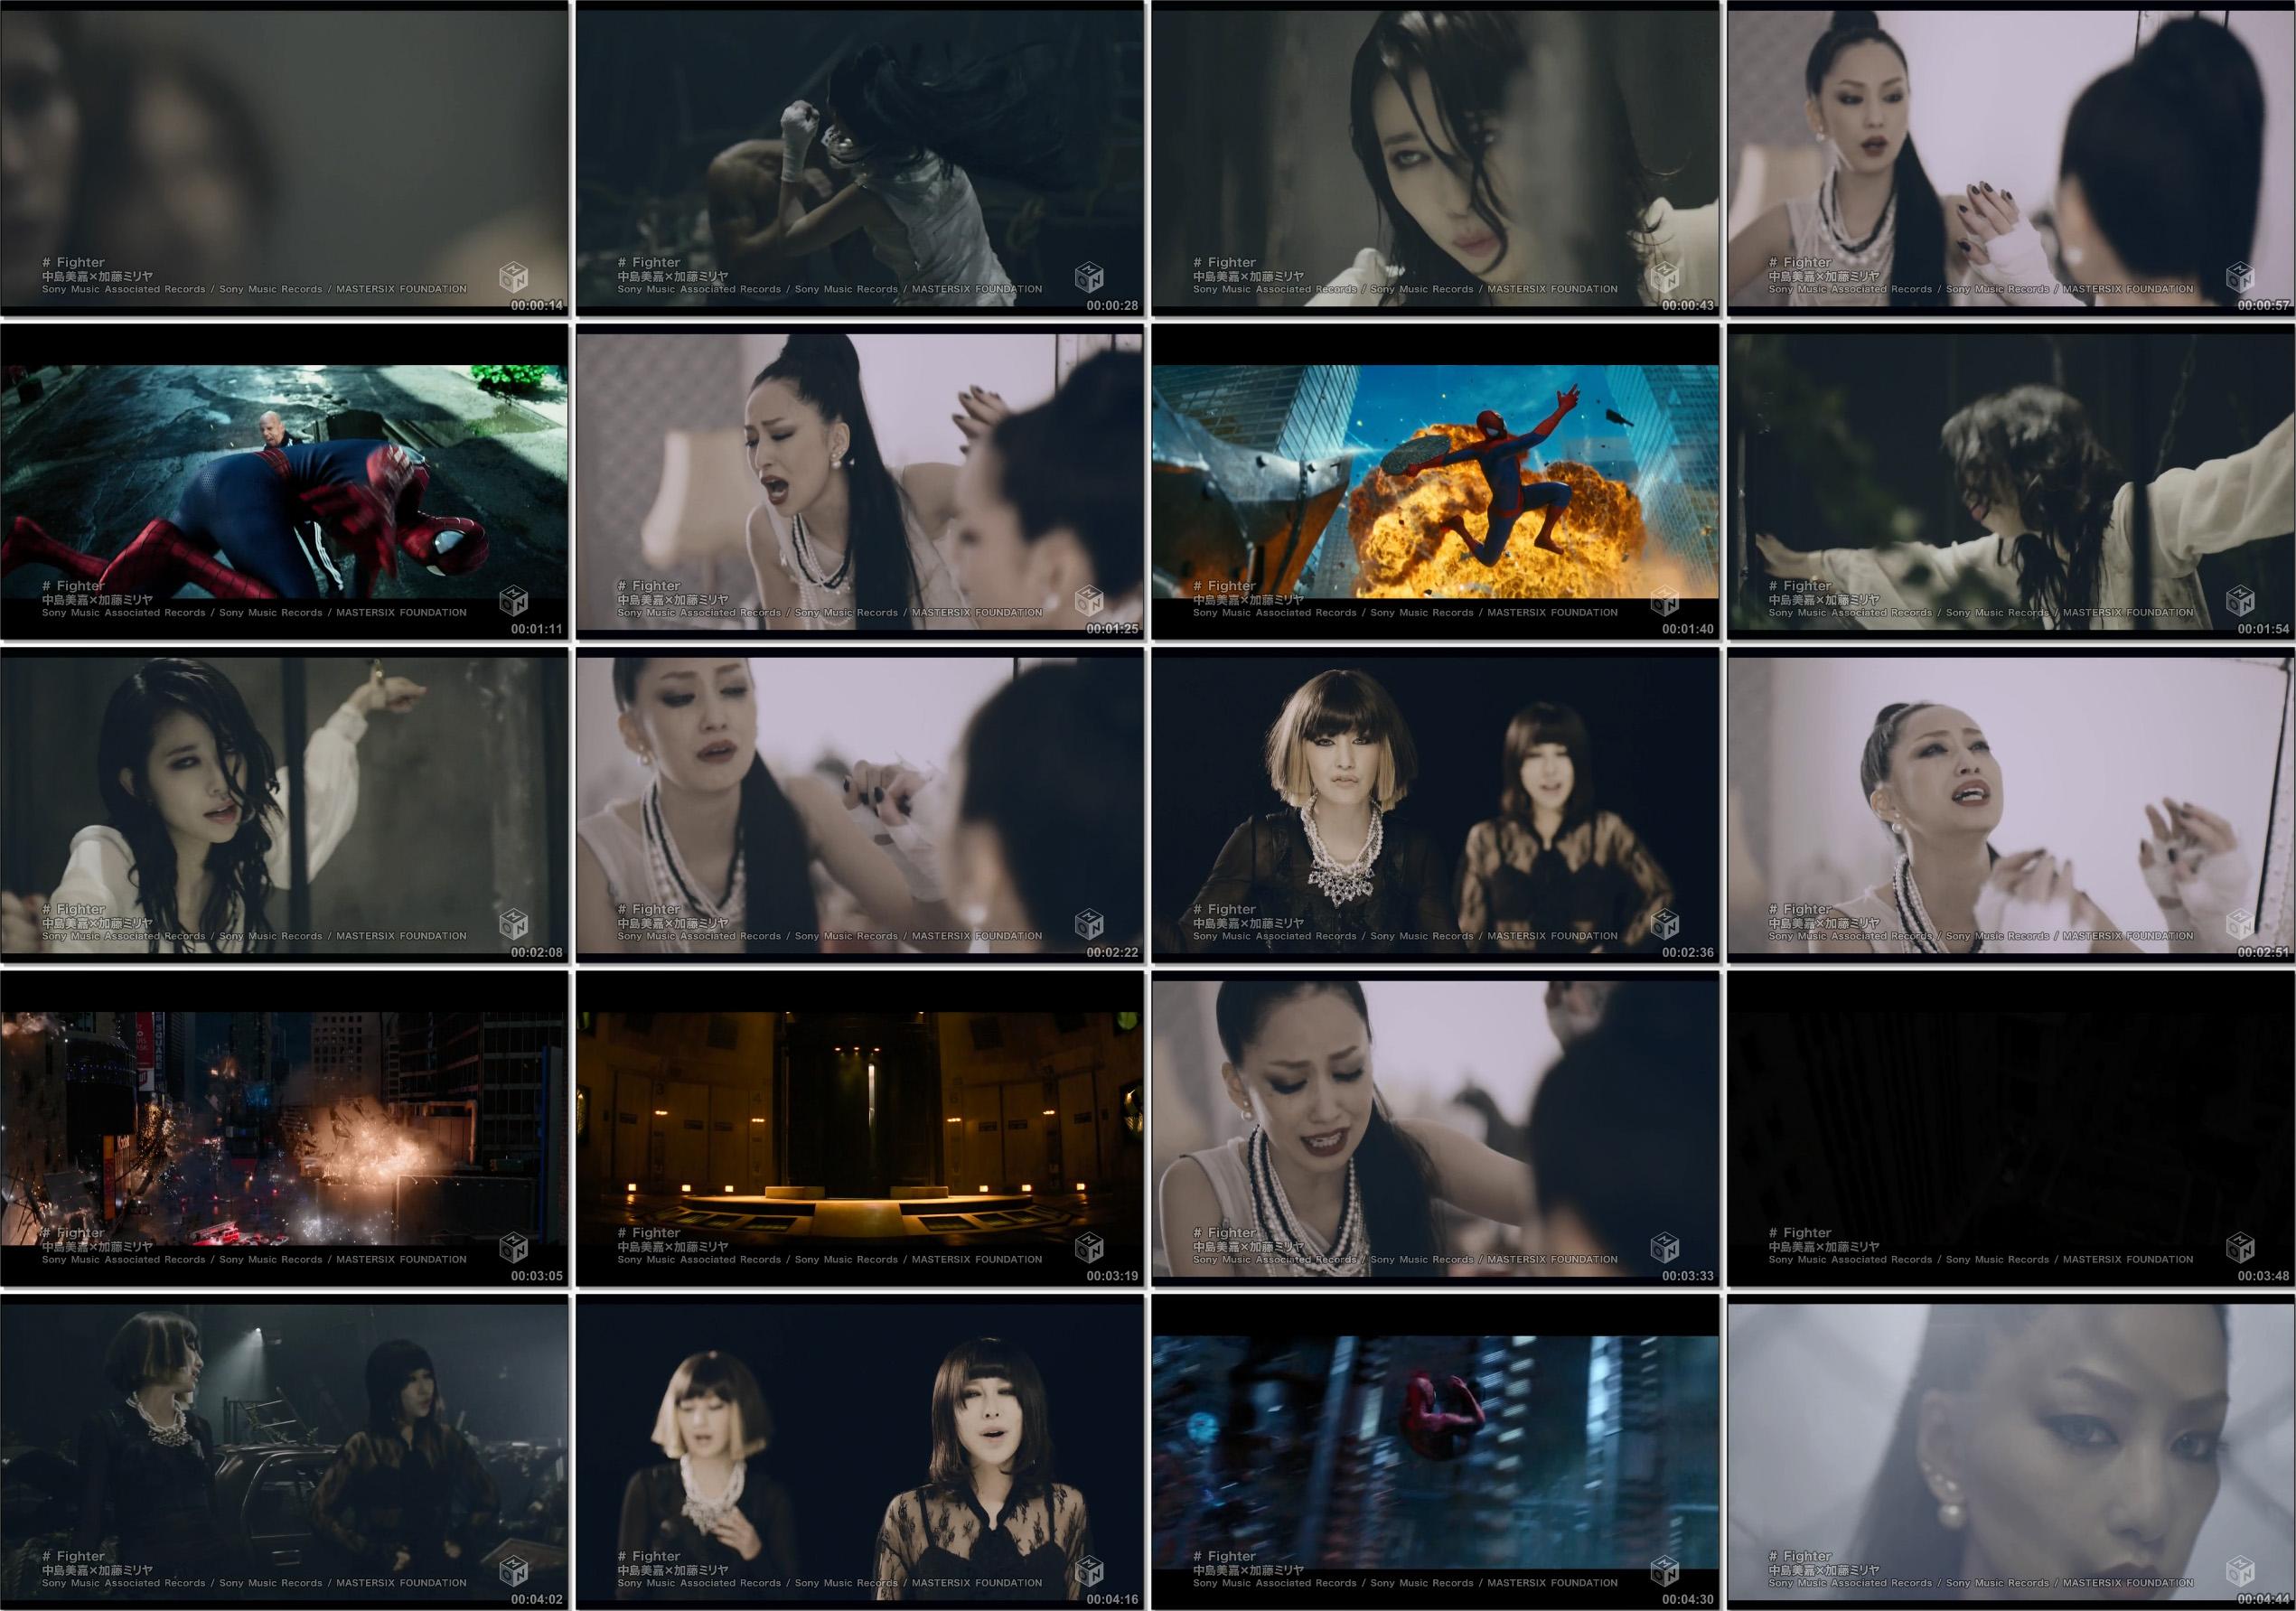 Mika Nakashima x Miliyah Kato - Fighter / Gift [2014.06.04]